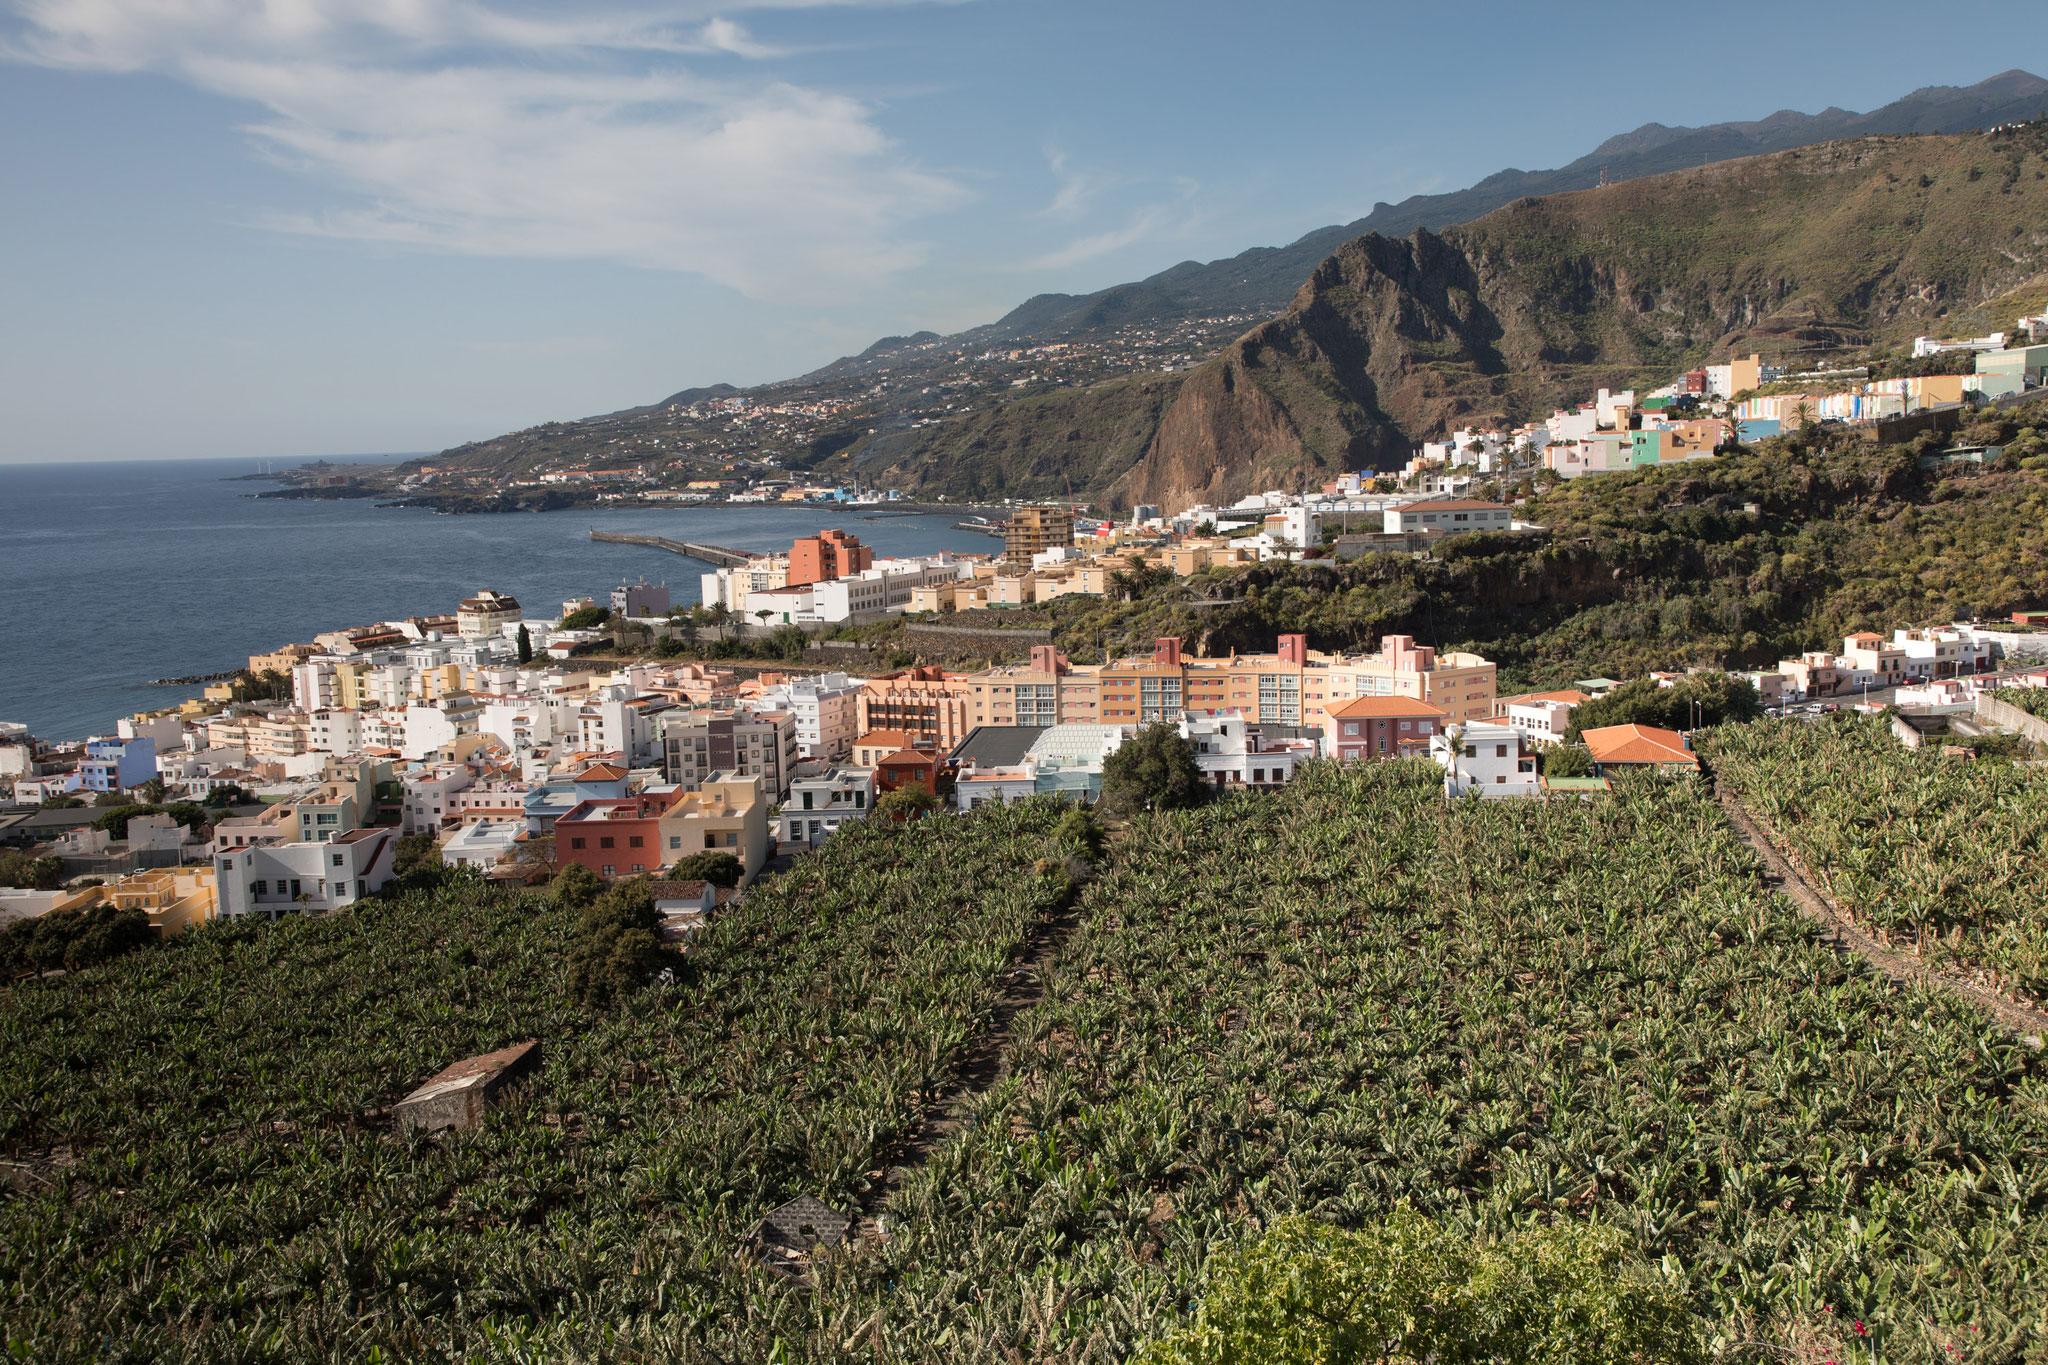 Blick auf die Hauptstadt Santa Cruz de la Palma